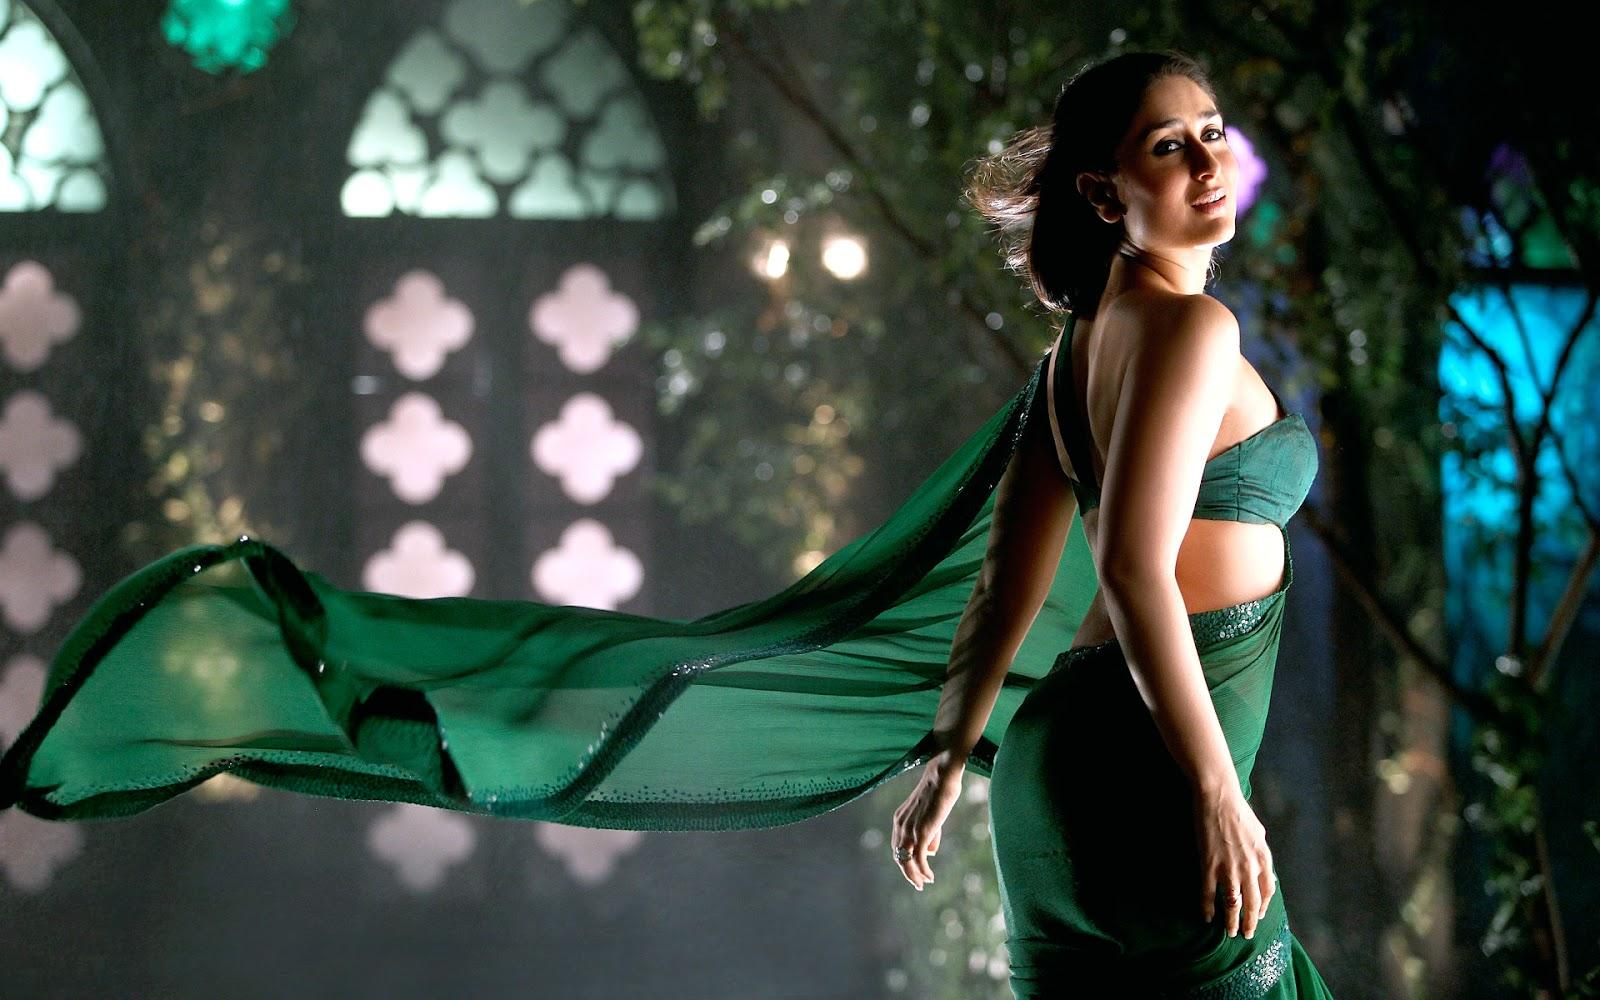 Kareena Kapoor hd wallpapers Kareena Kapoor hot hd wallpapers 1600x1000